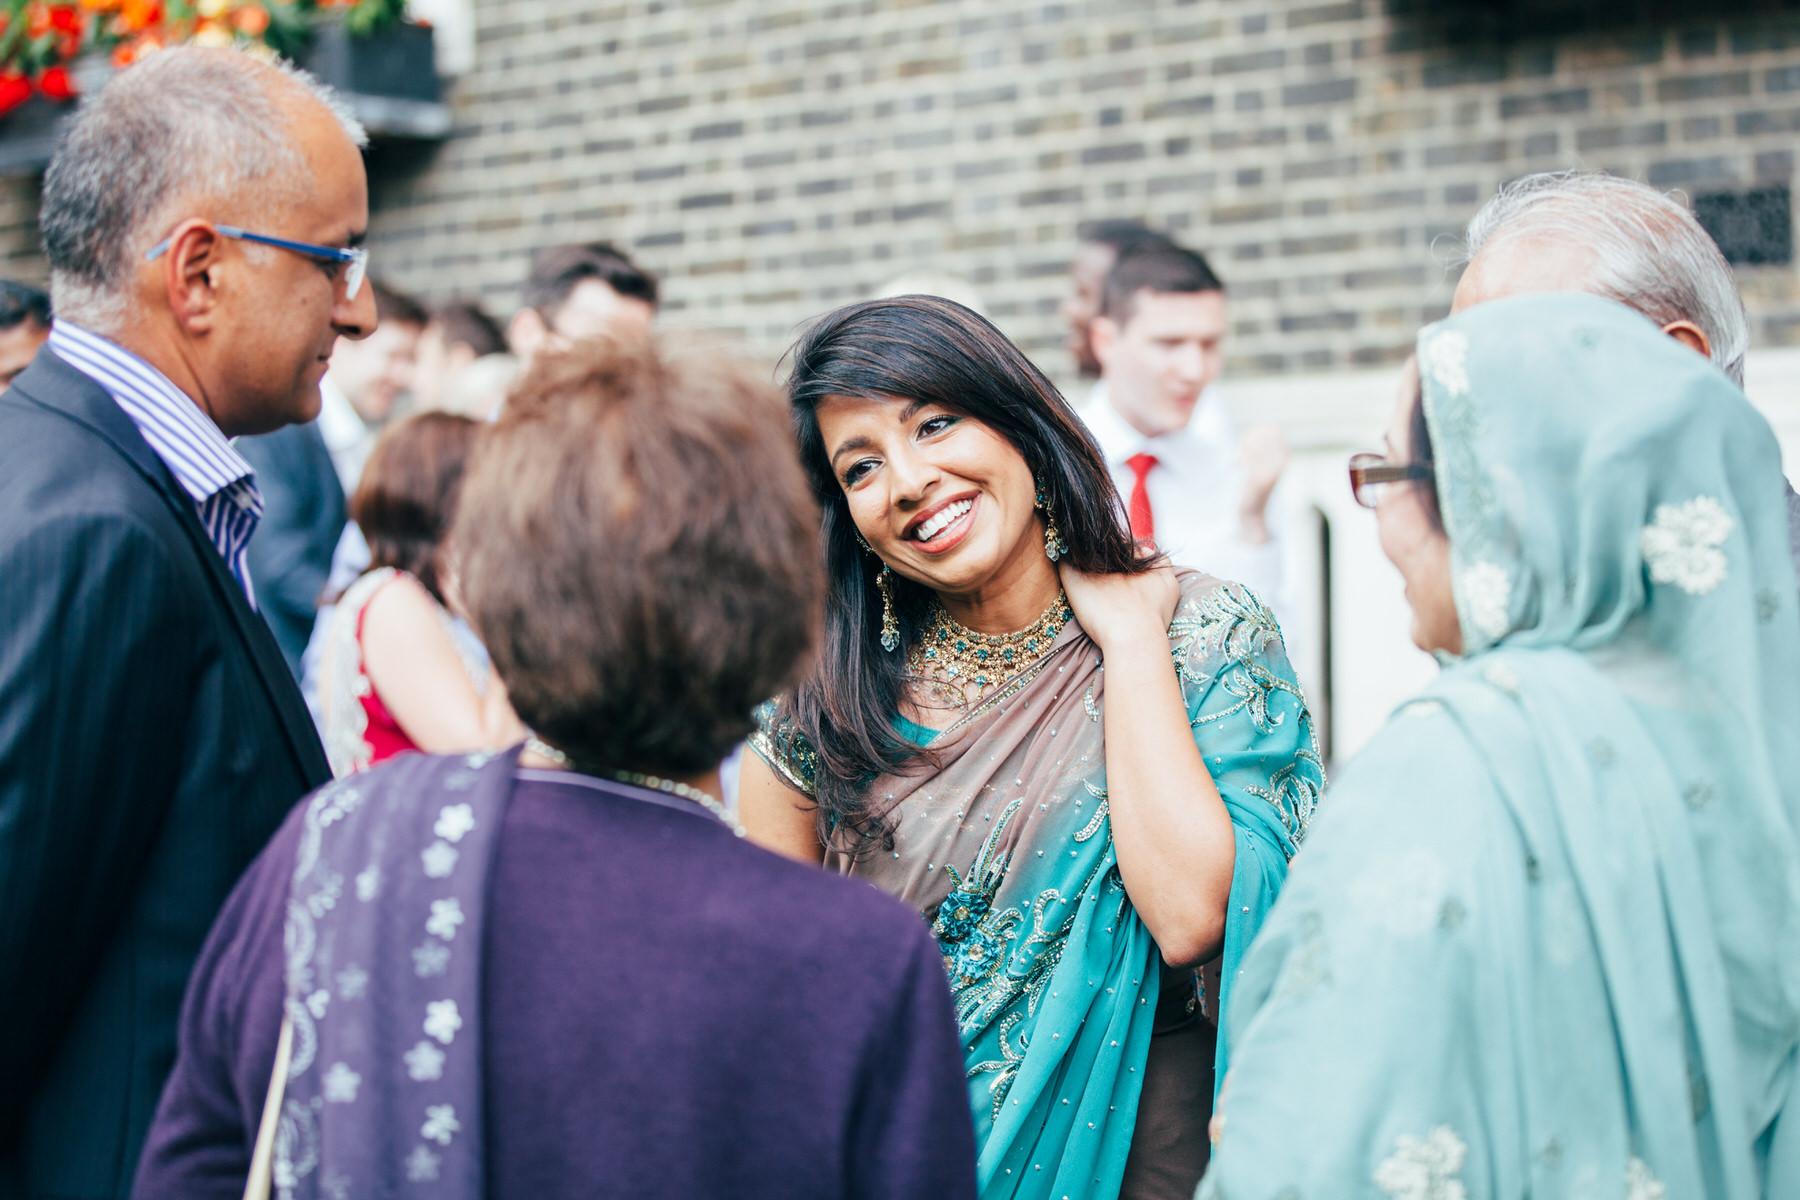 139-Anglo-Asian-London-Wedding-happy-guest-green-sari.jpg